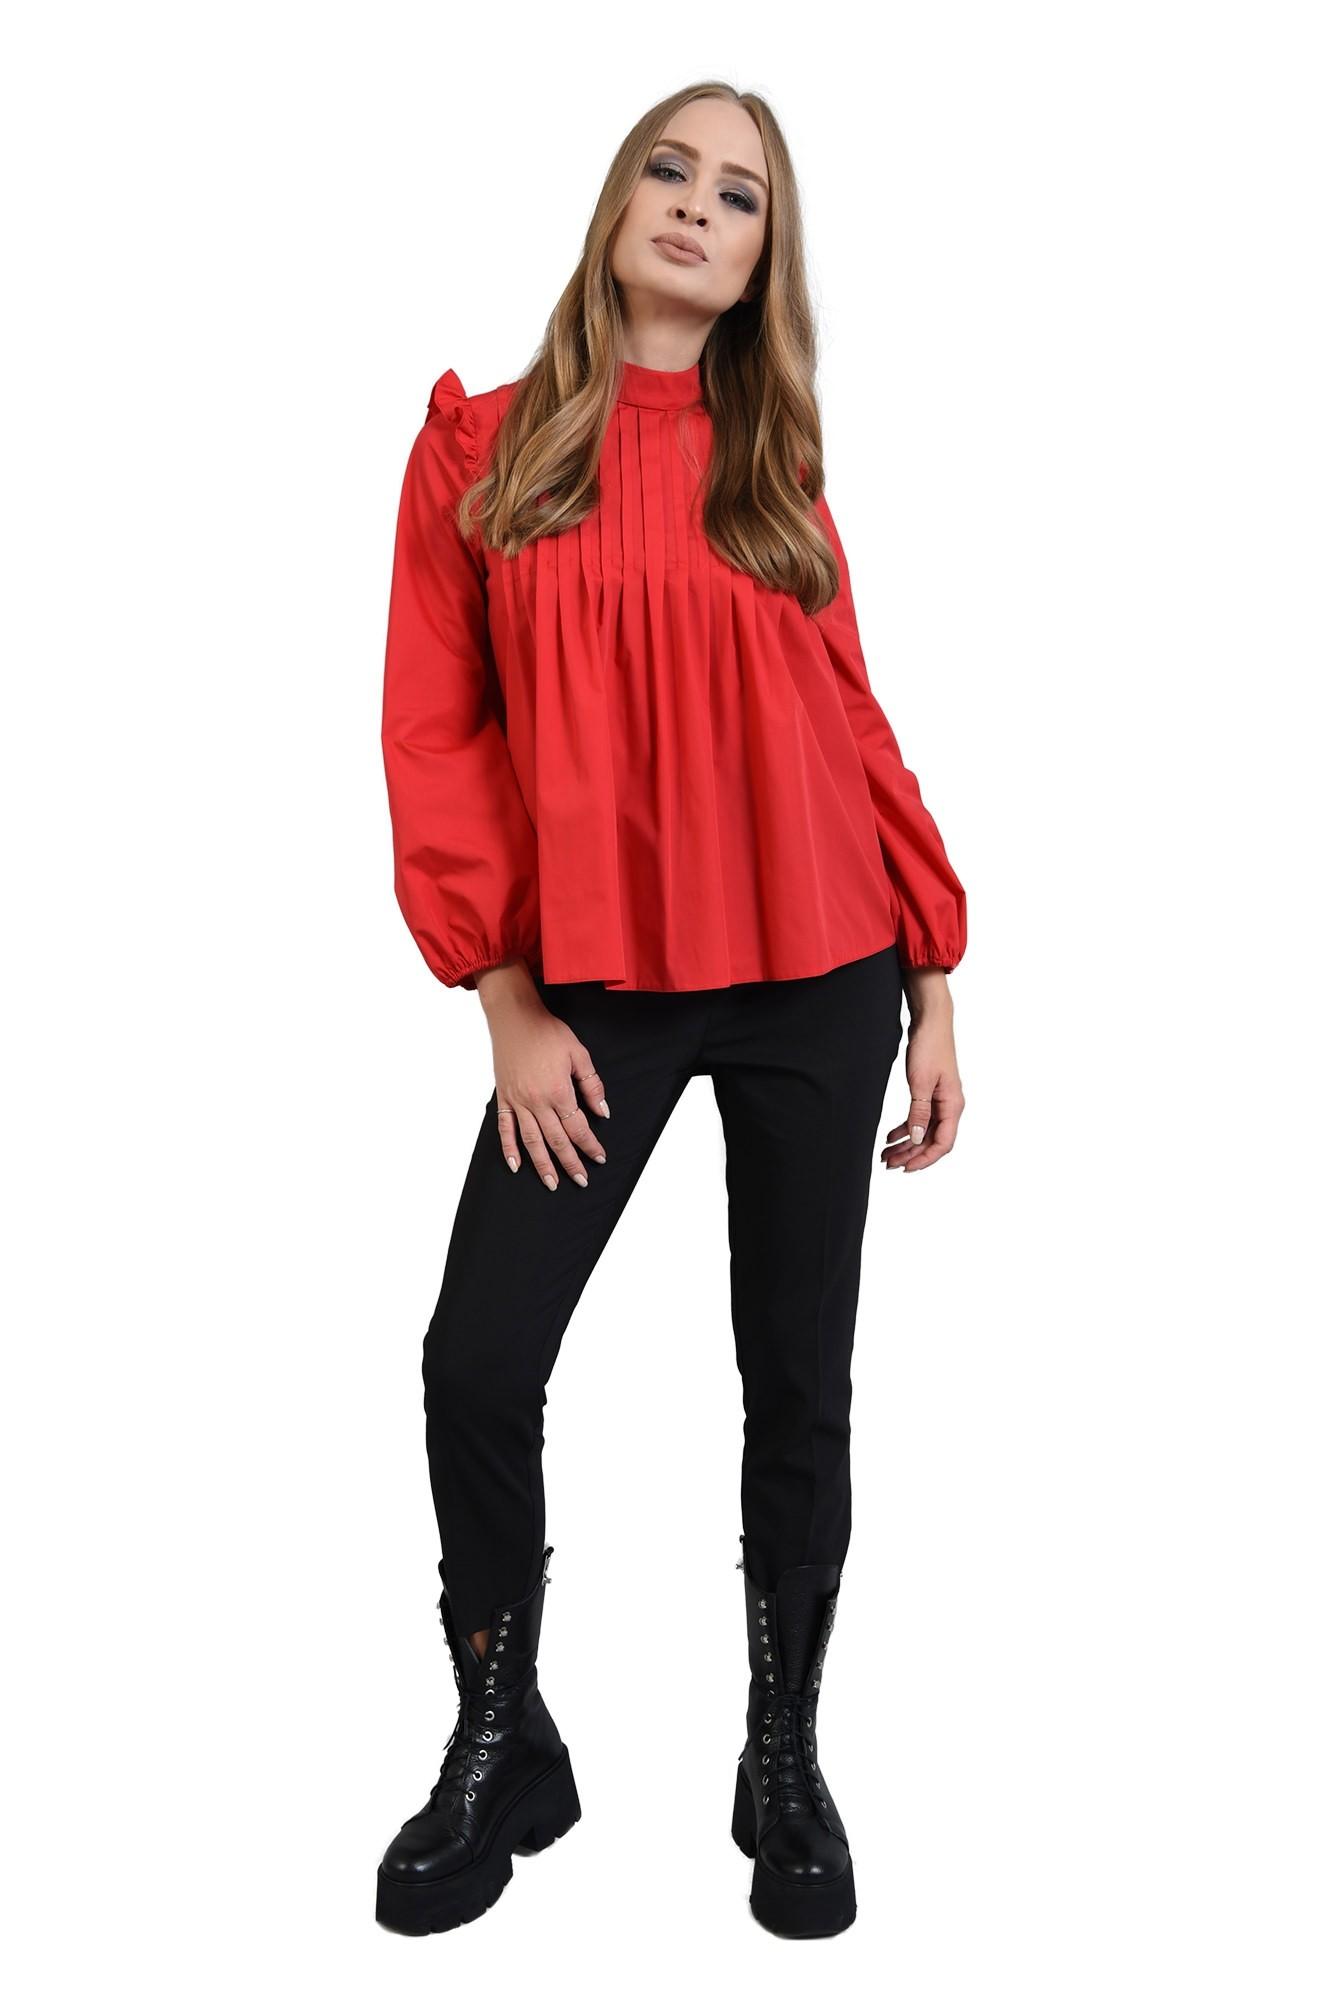 360 - bluza rosie din bumbac, cu pliuri si volan, Poema